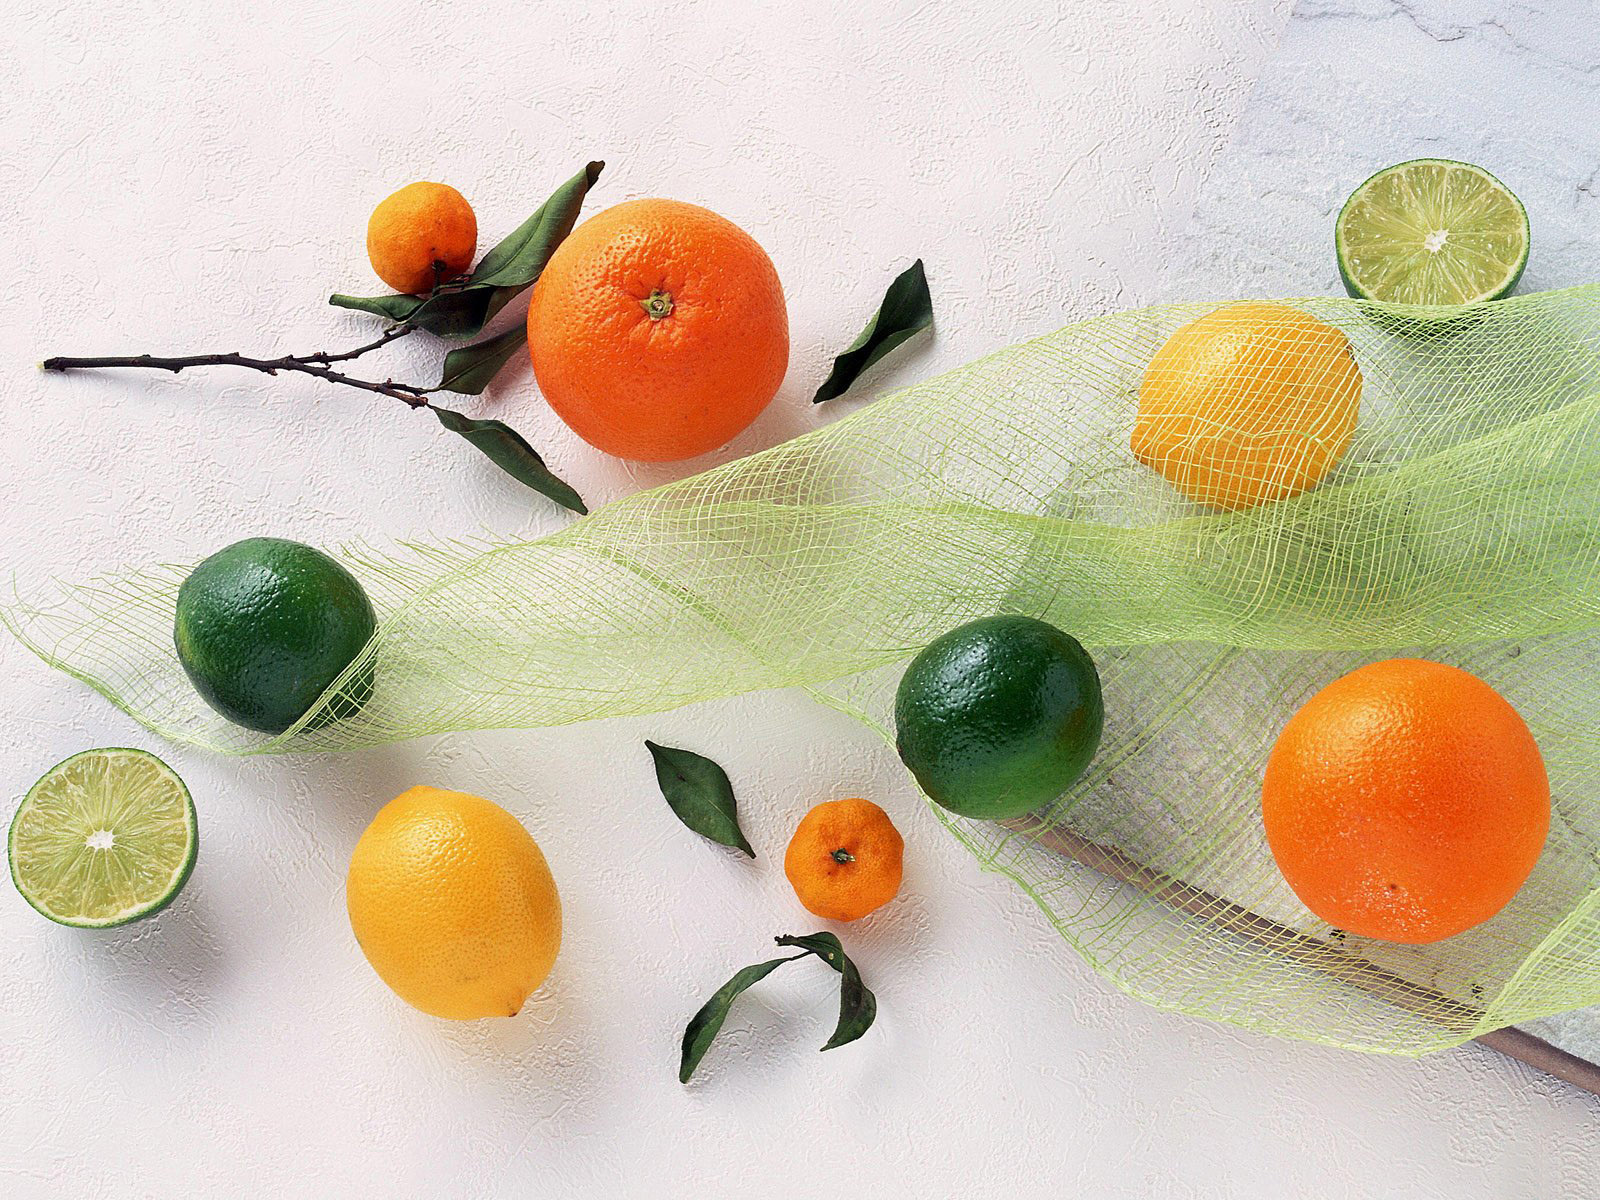 Healthy Foods Wallpaper 3 Background   Hivewallpapercom 1600x1200